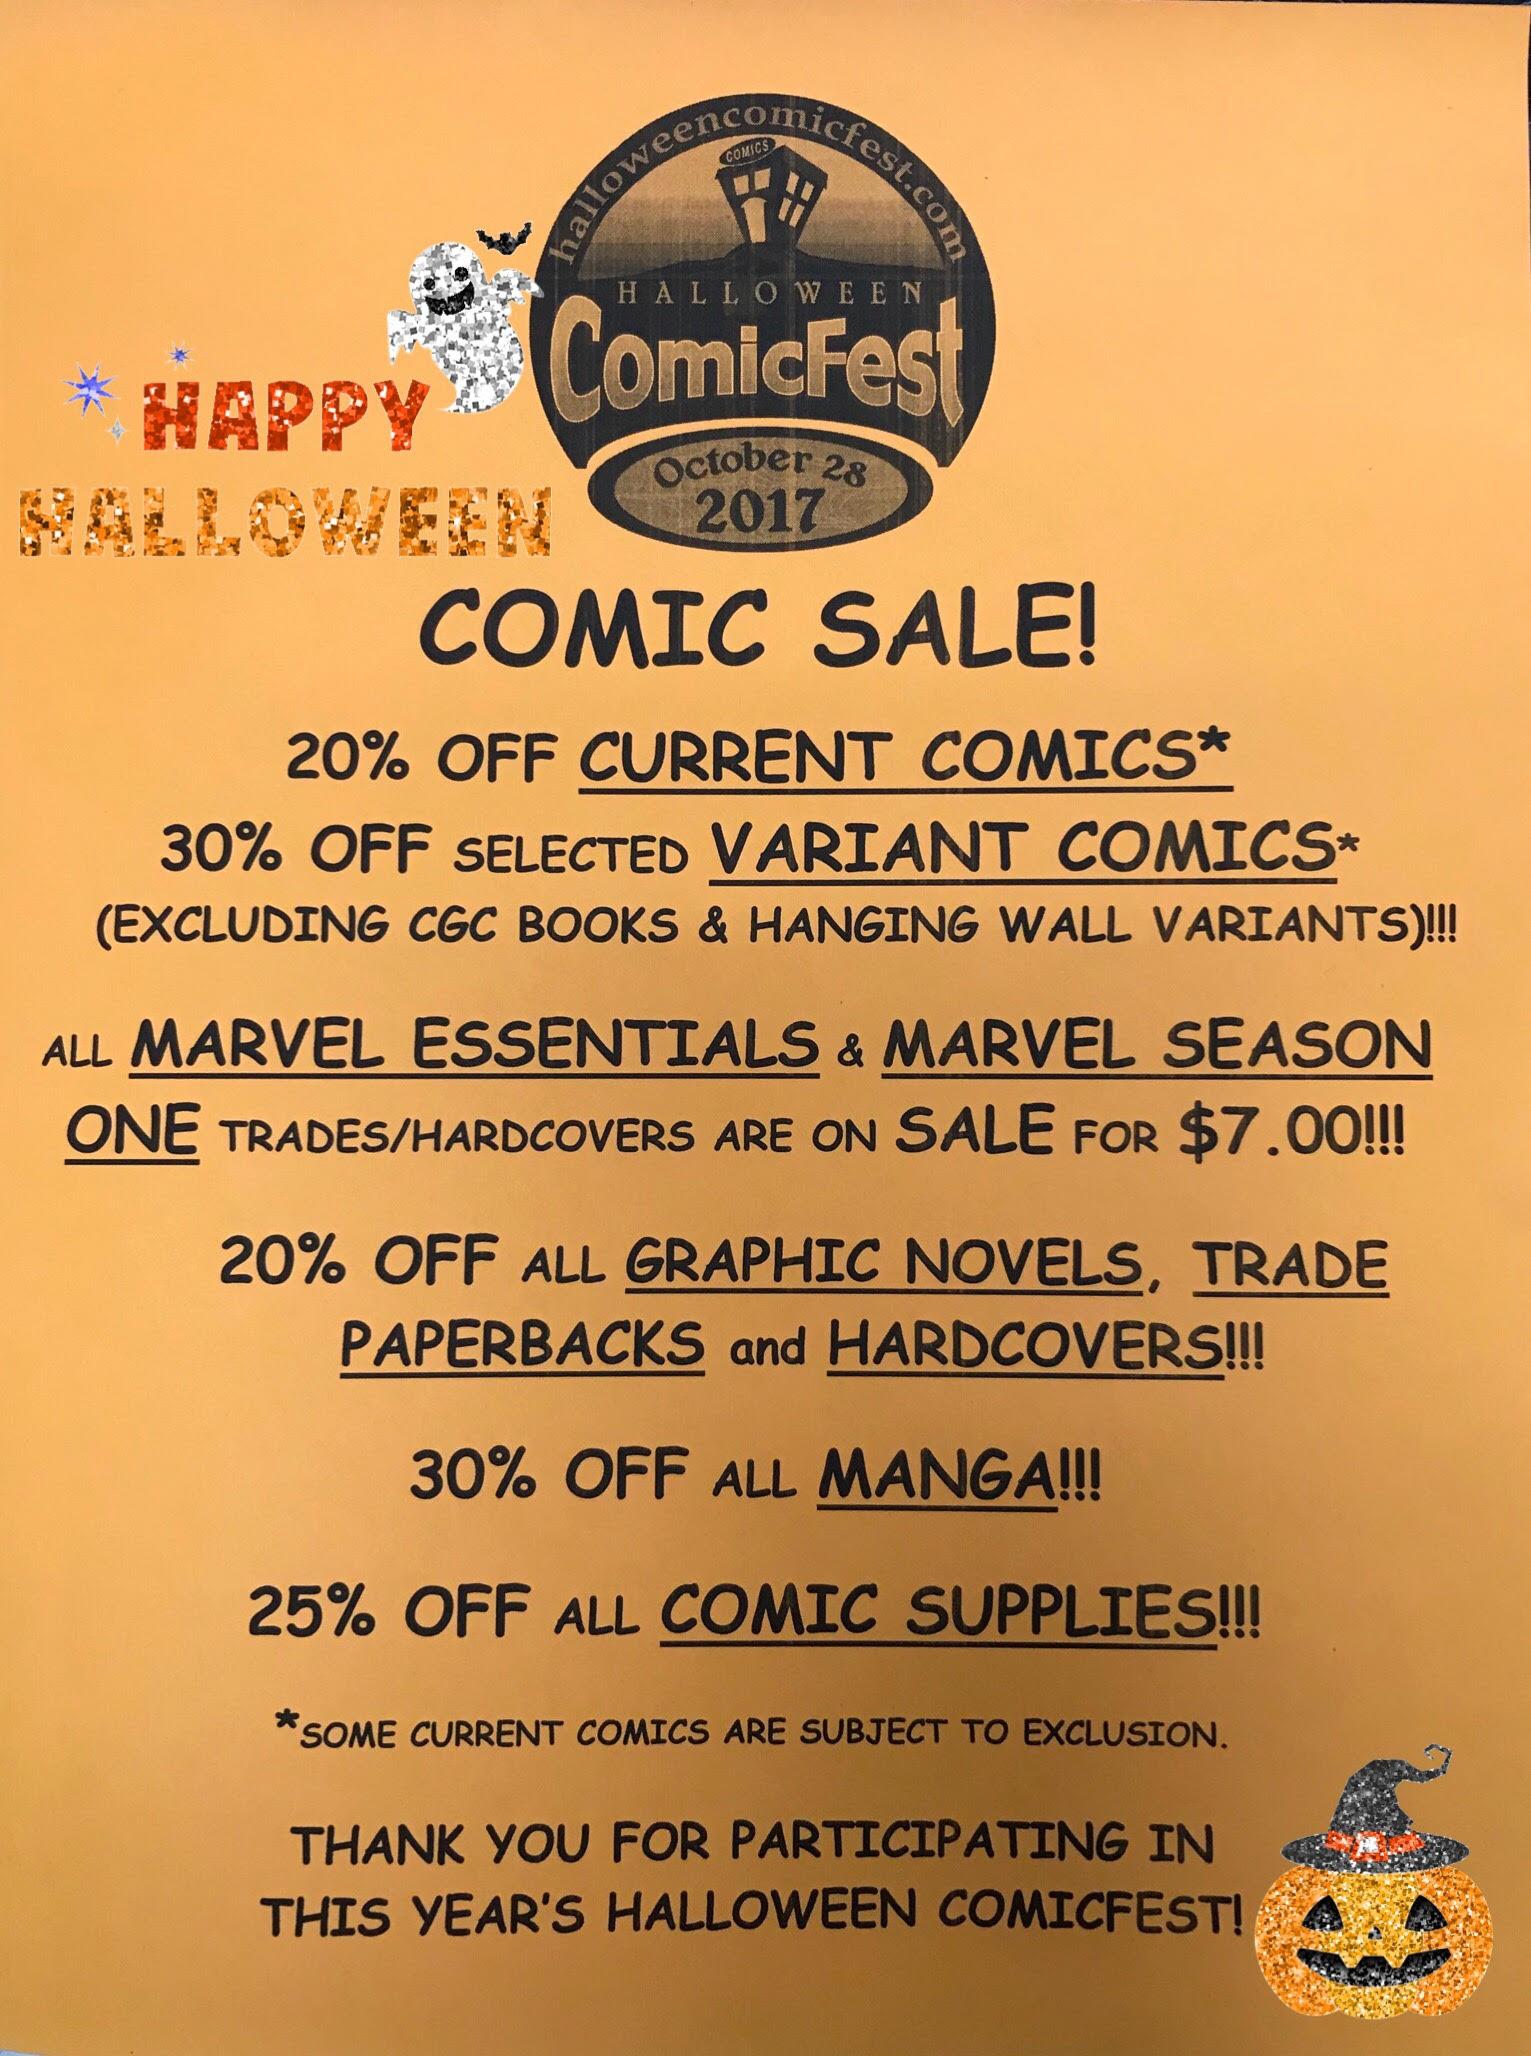 halloween comic fest comic.jpg